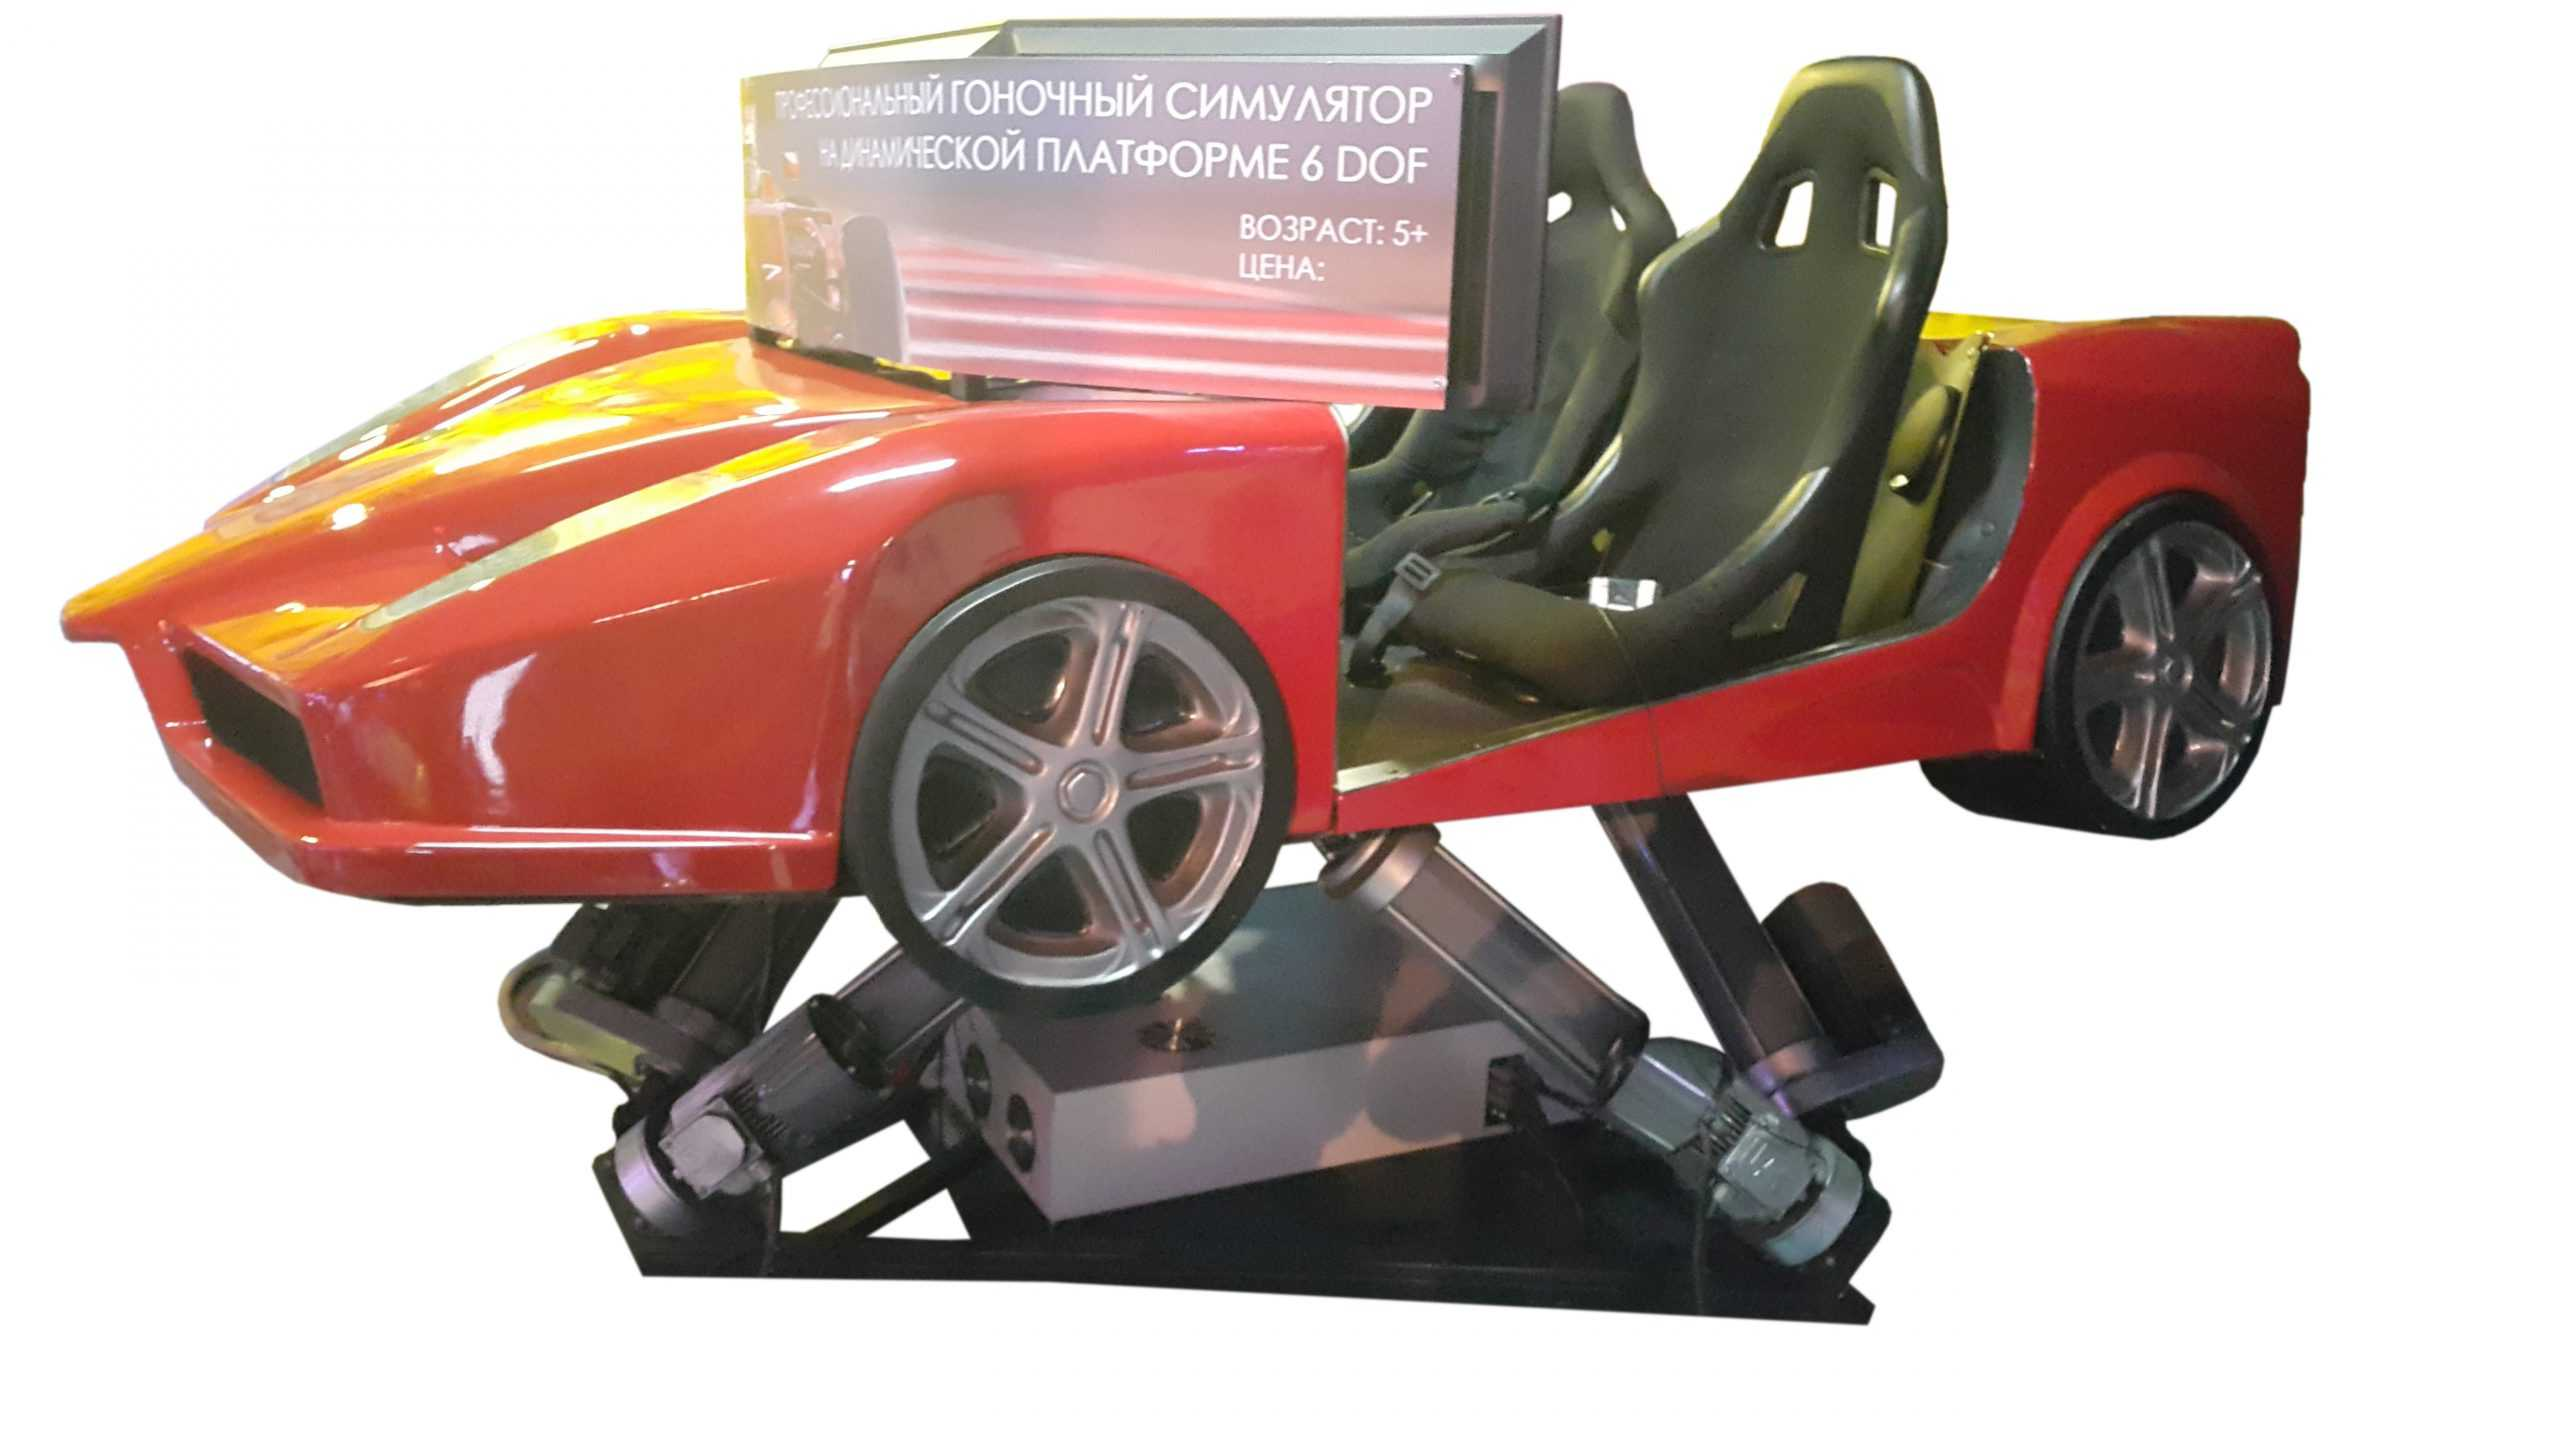 Ferrari_3 Full motion racing simulator 2dof, 3dof,4dof,6dof motion platform